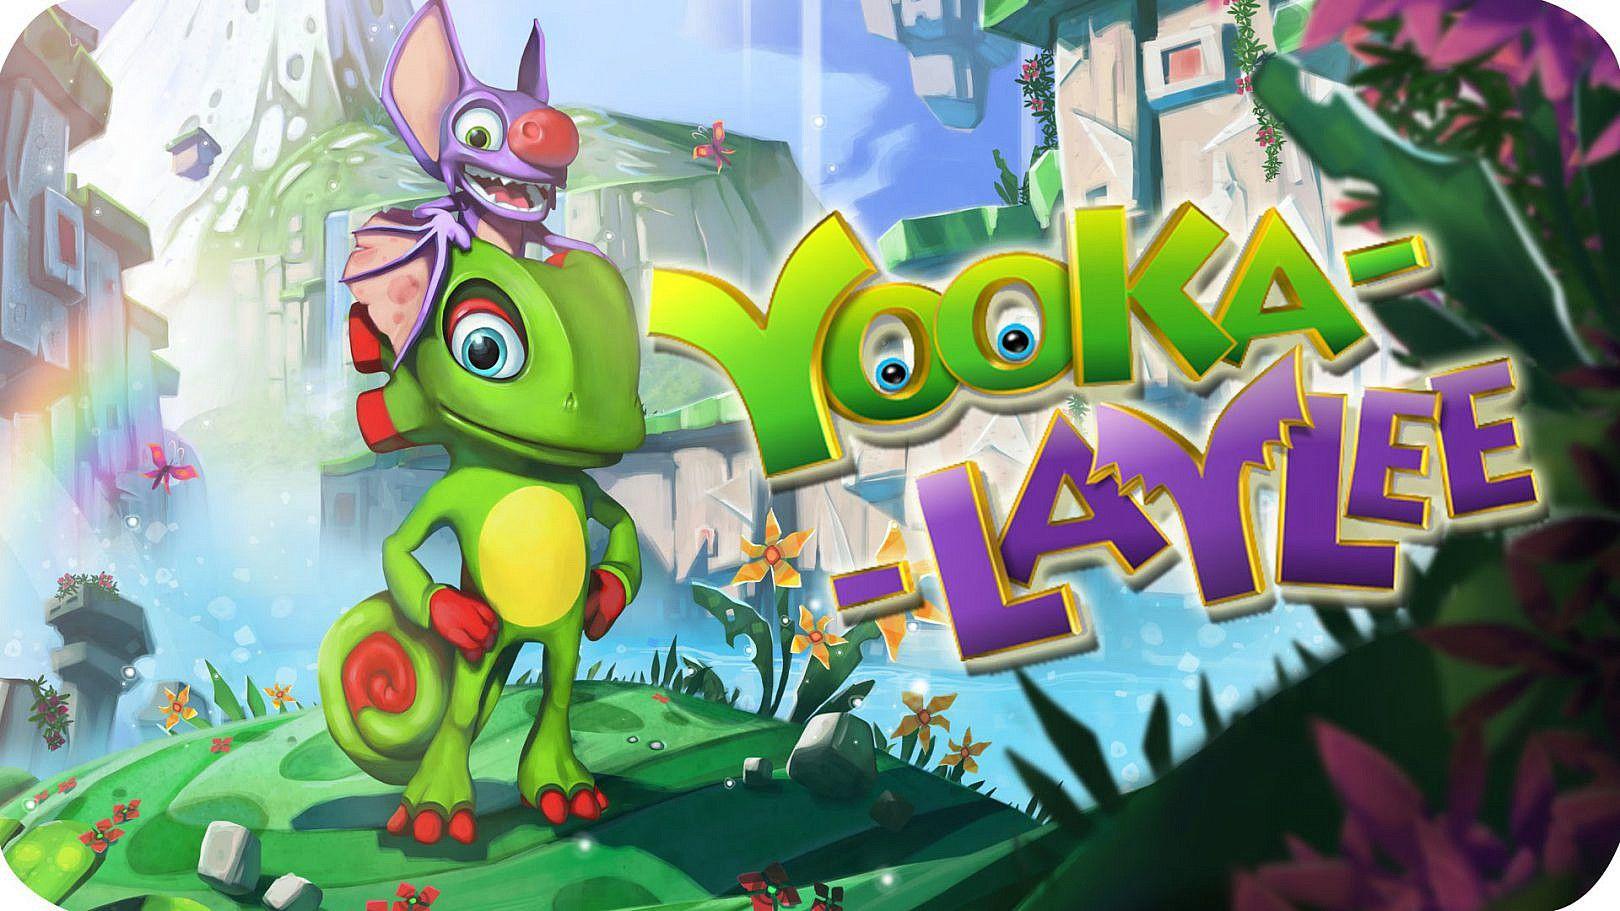 Juegos YOOKA-LAYLEE Nintendo Switch